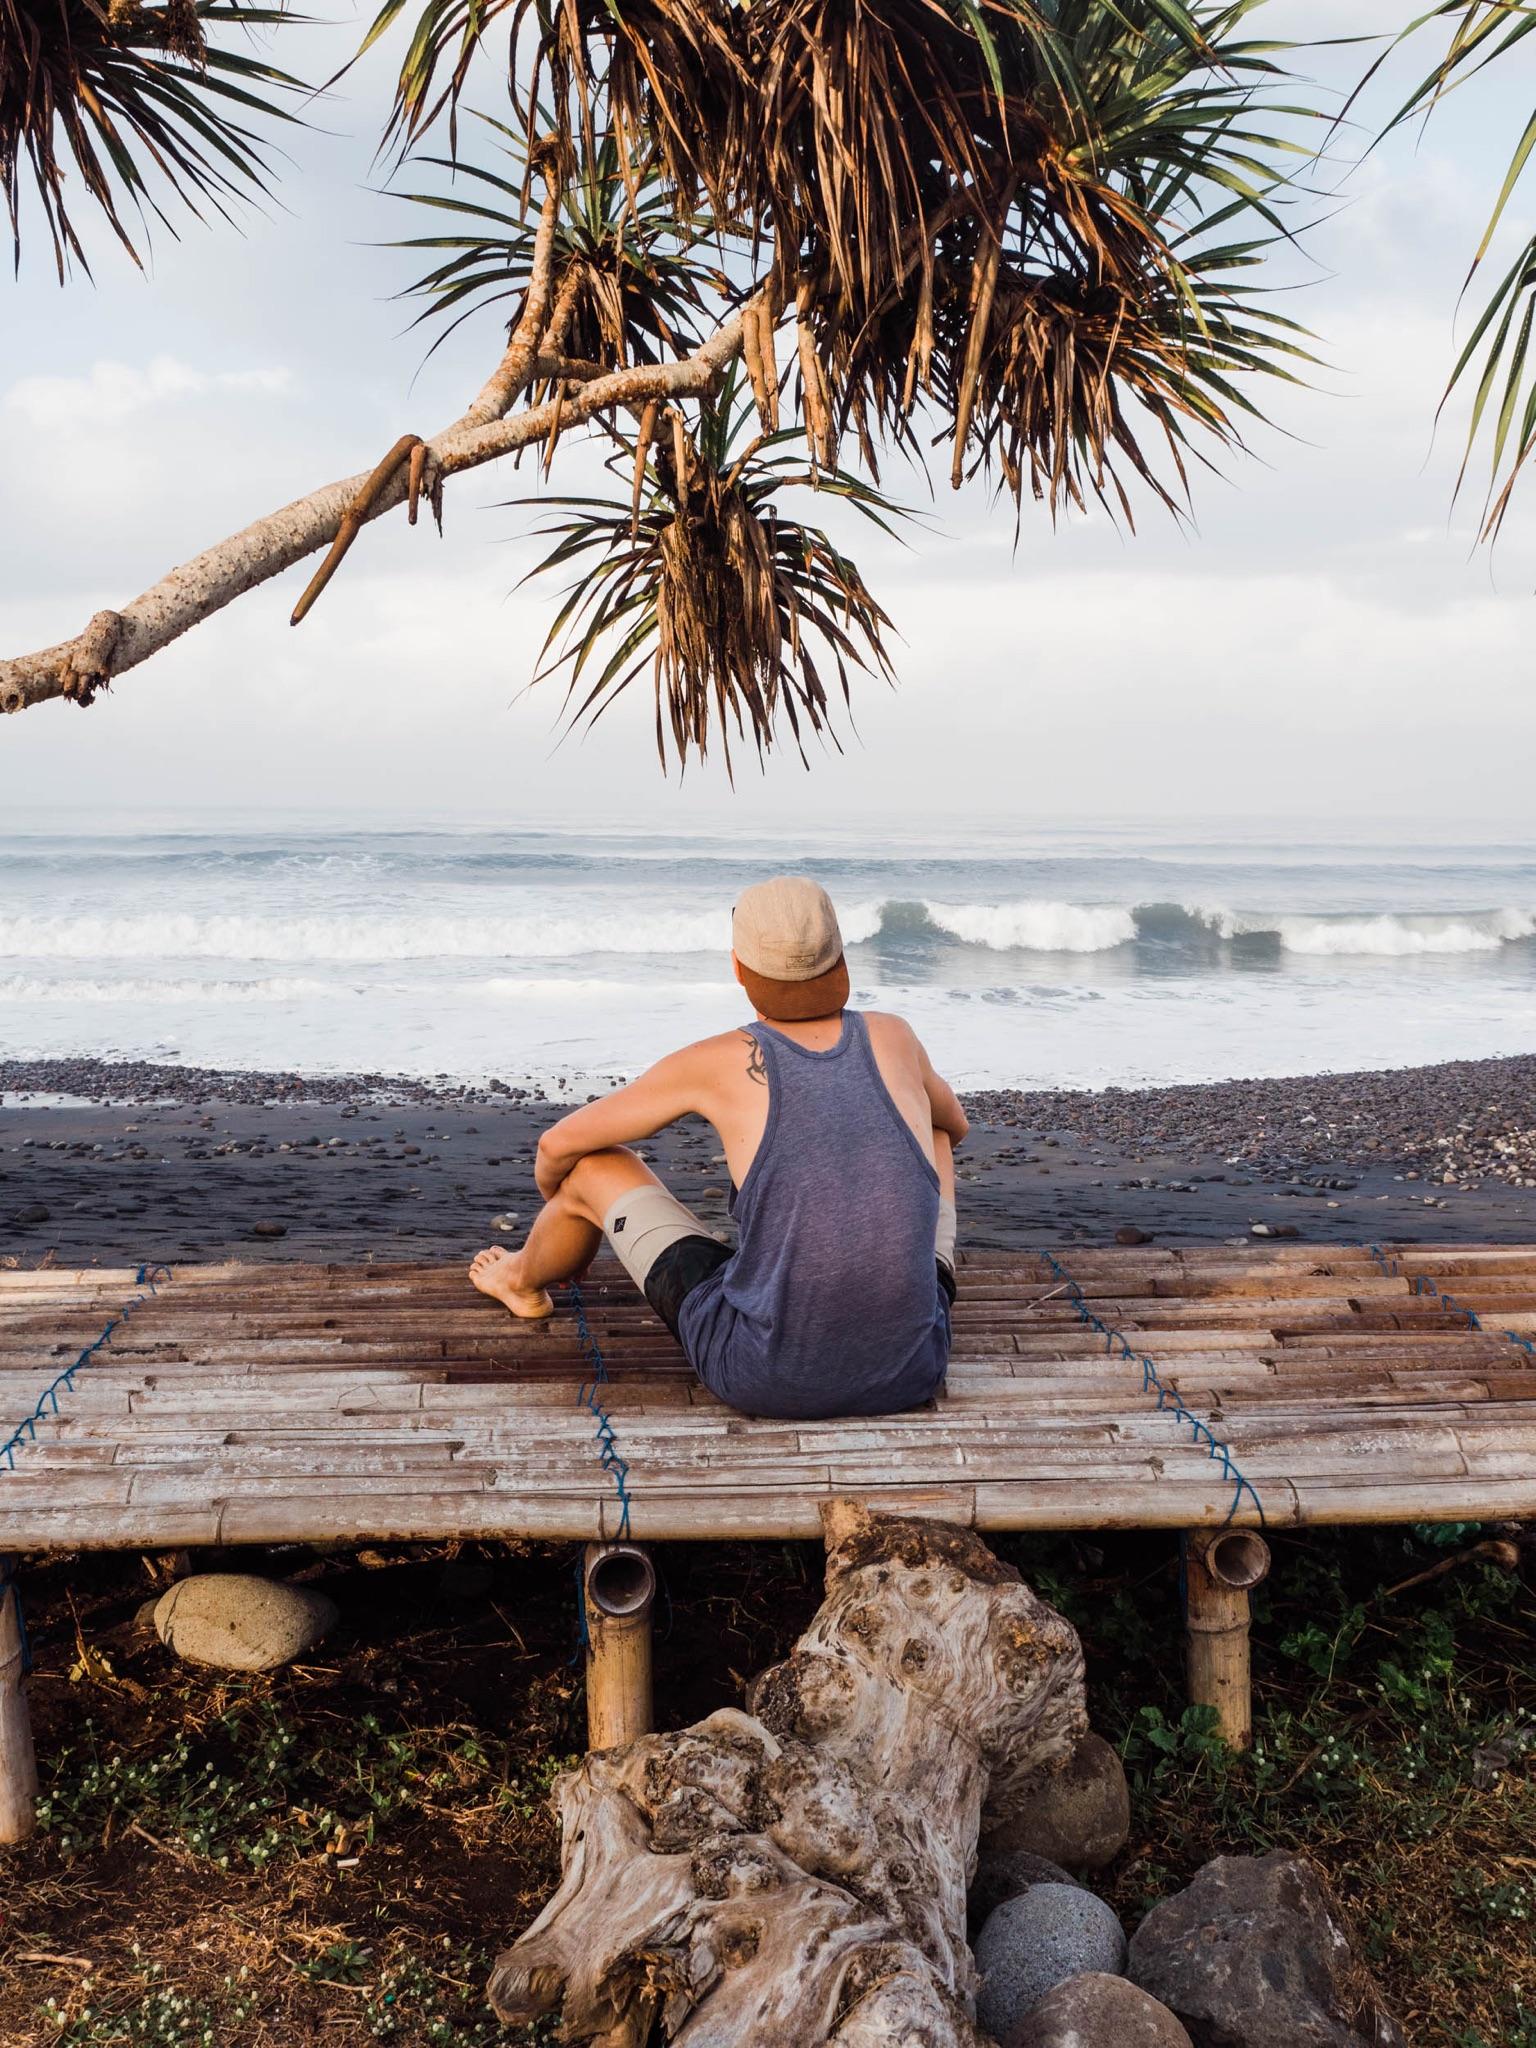 Yves am Strand in Bali